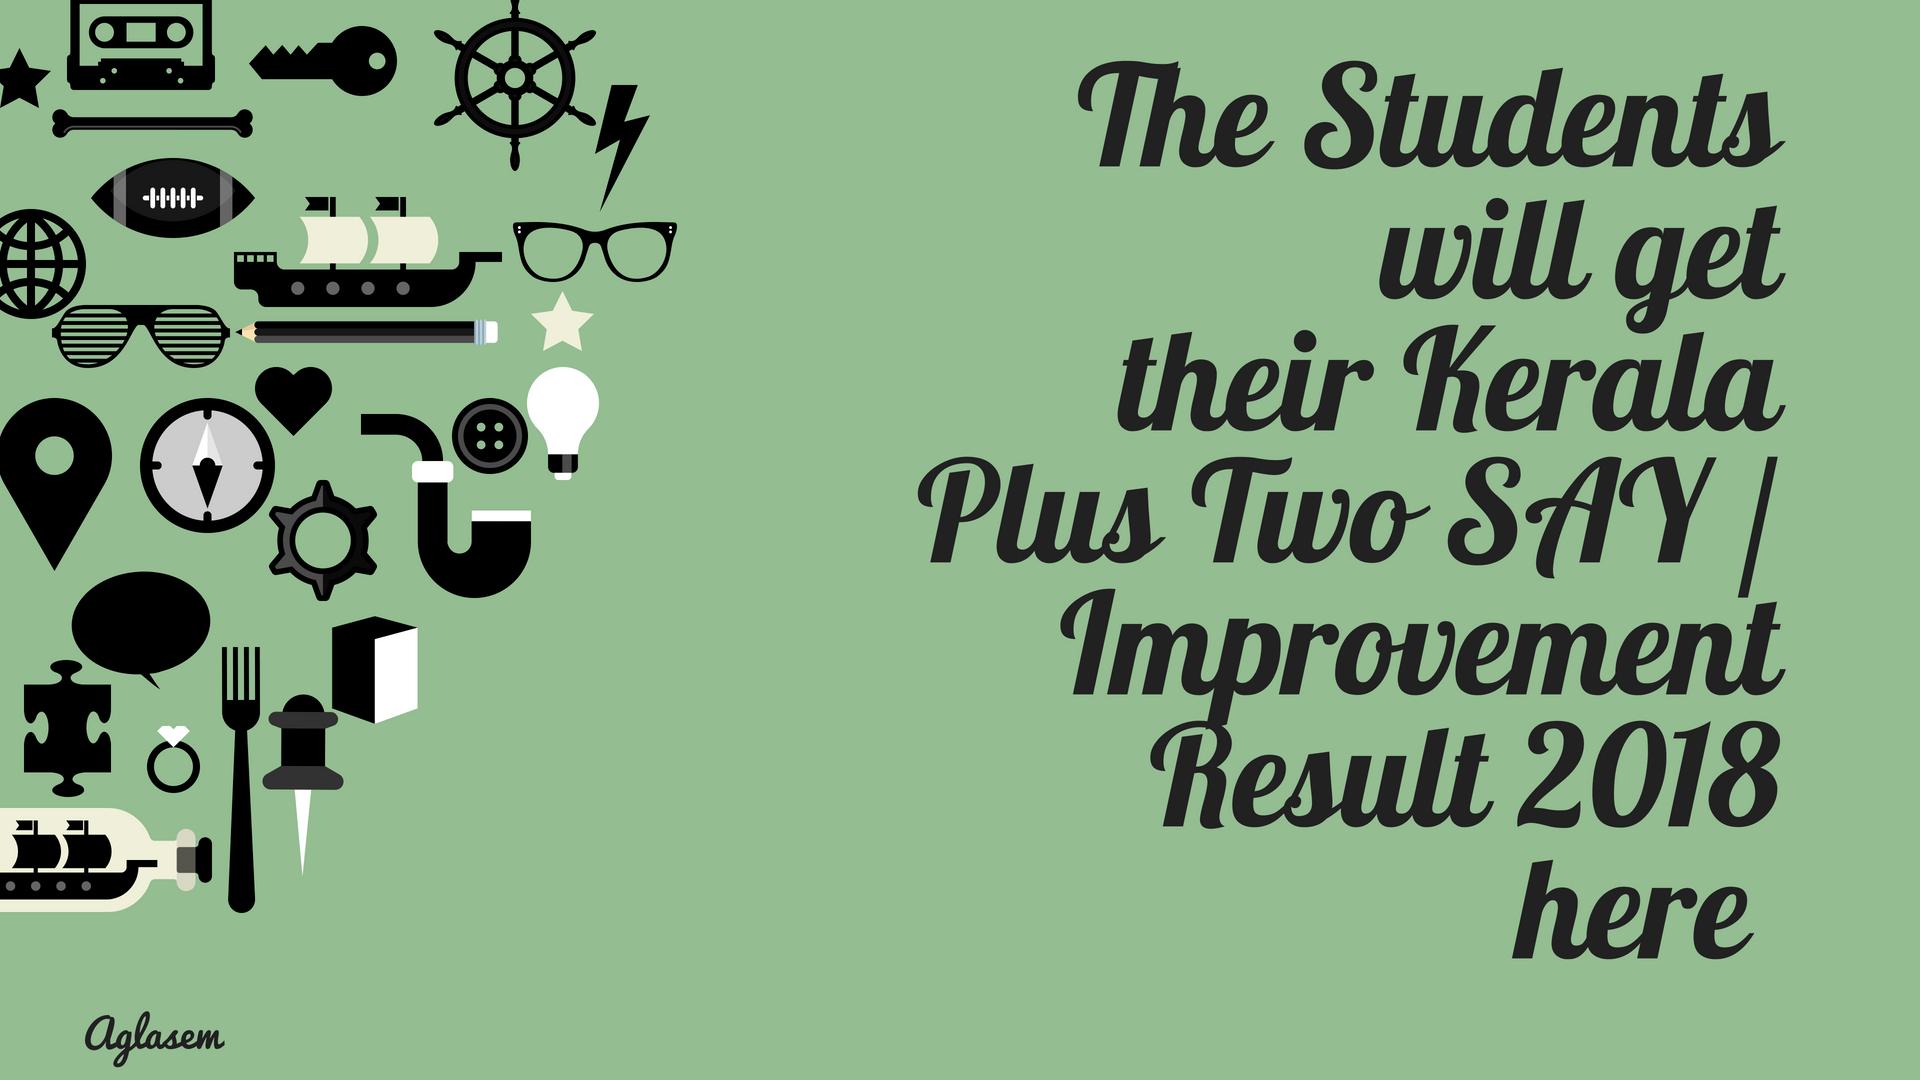 Kerala Plus Two SAY / Improvement Result 2018